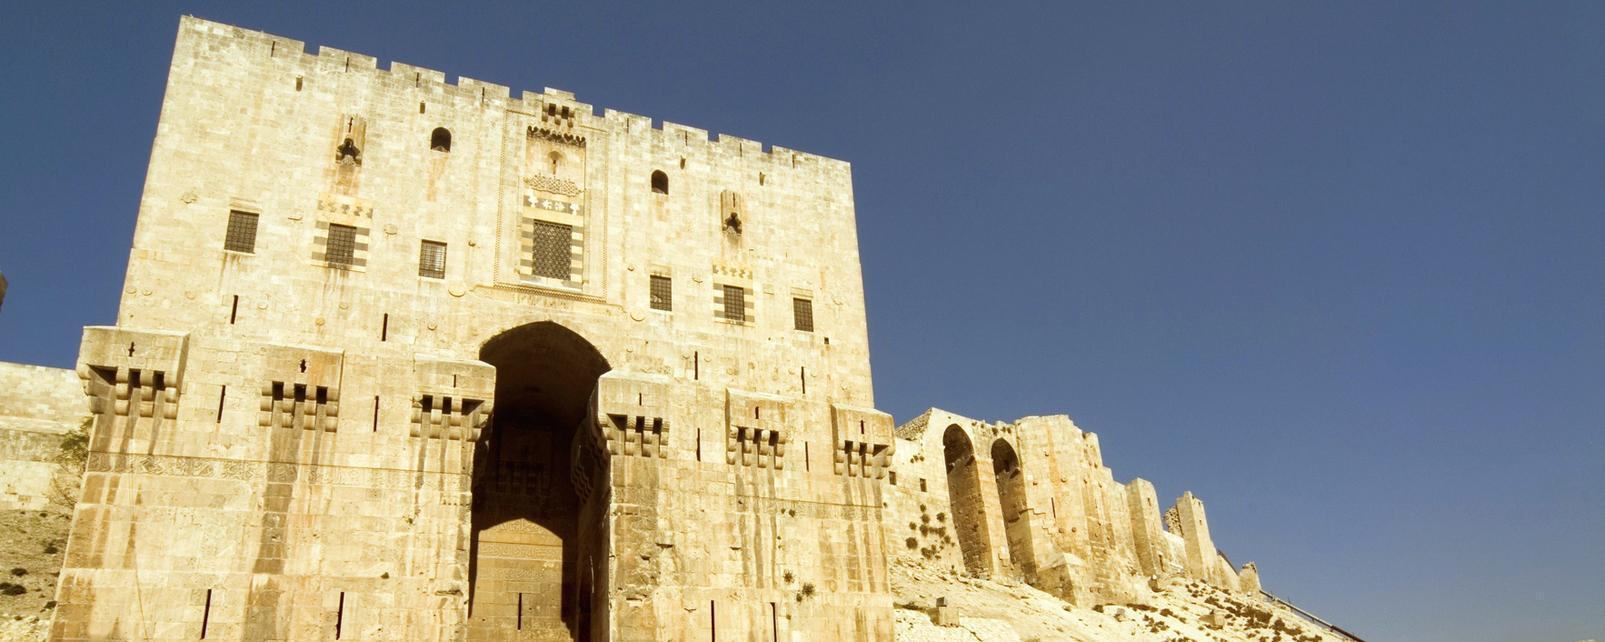 Moyen-Orient; Syrie; Alep;